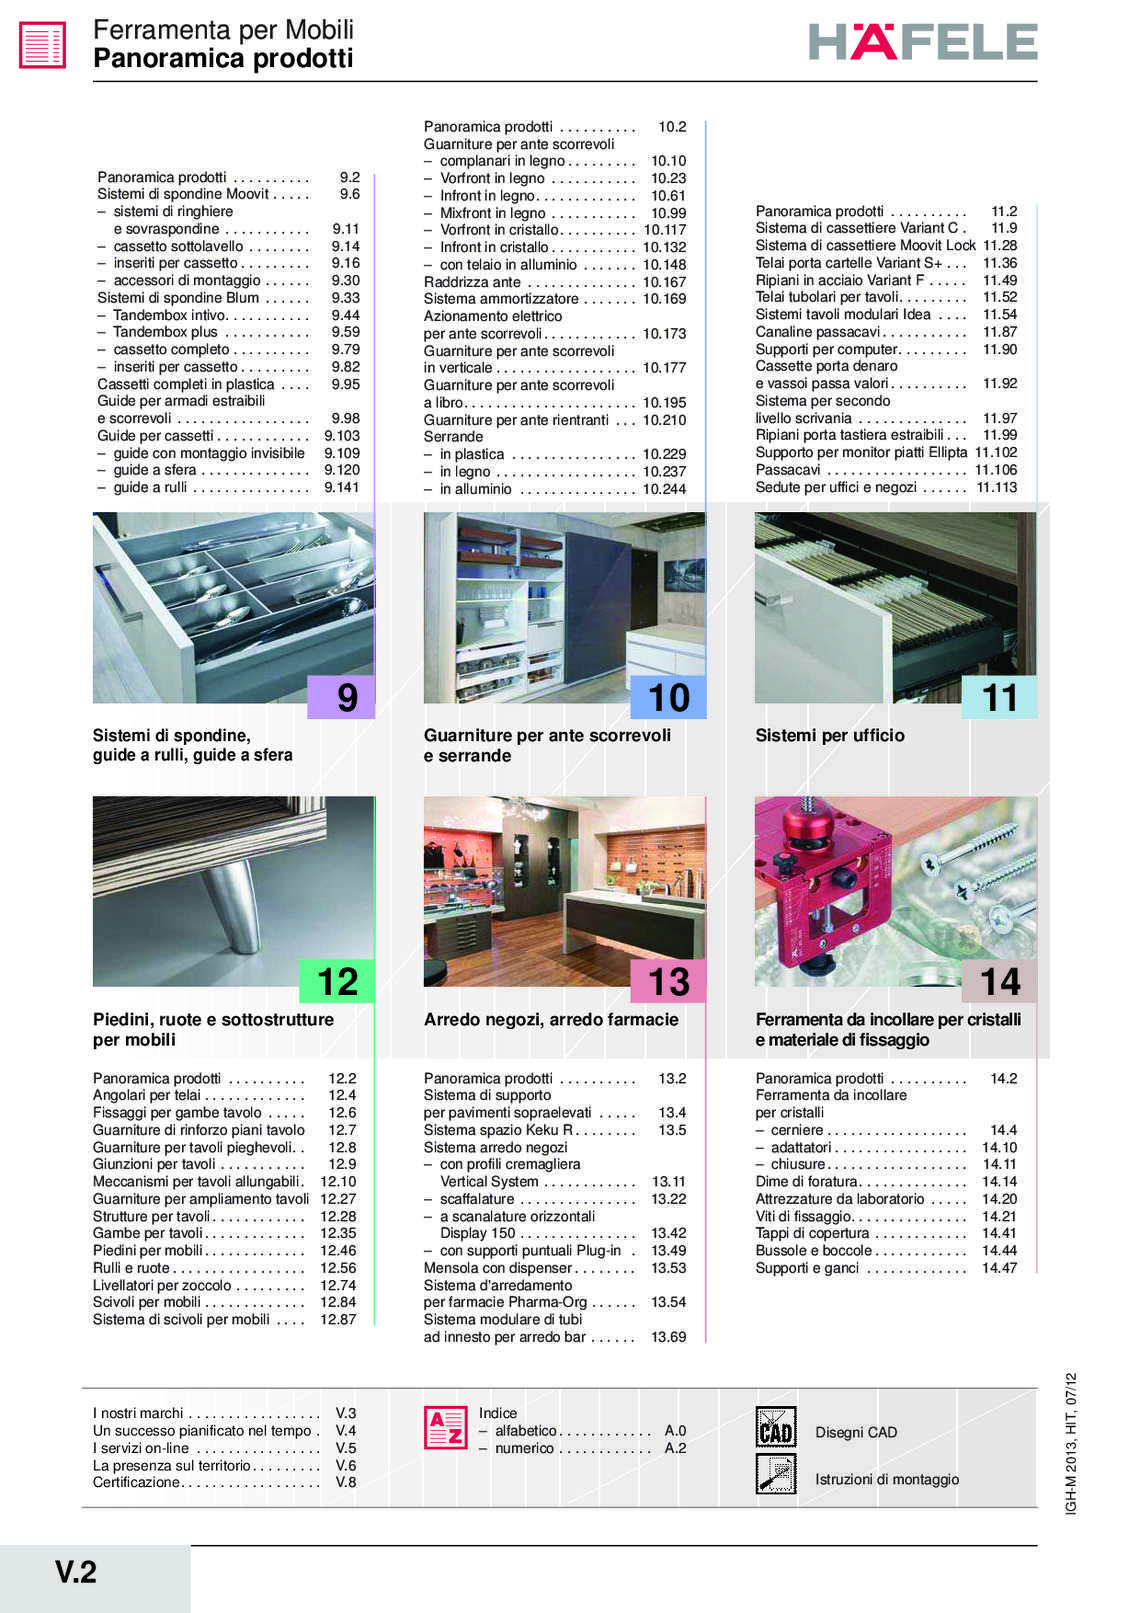 hafele-spondine-e-guide-per-mobili_40_003.jpg